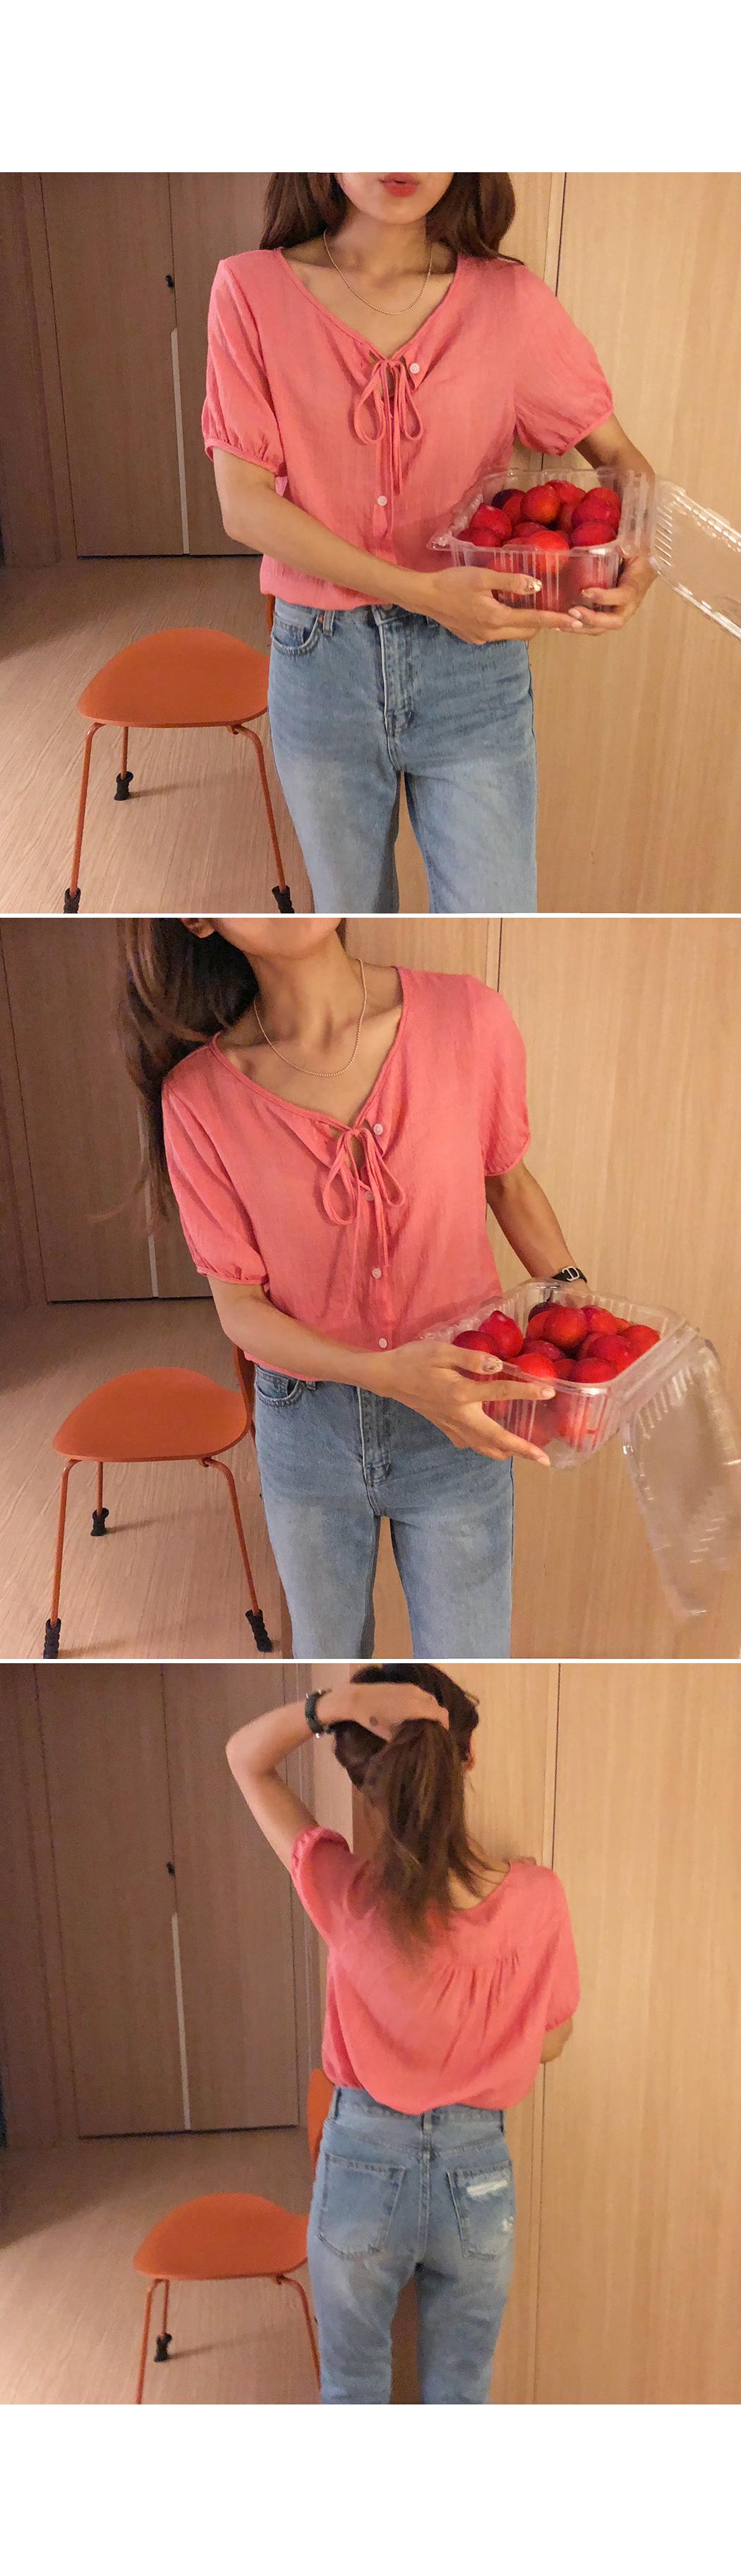 Cherries-blouse